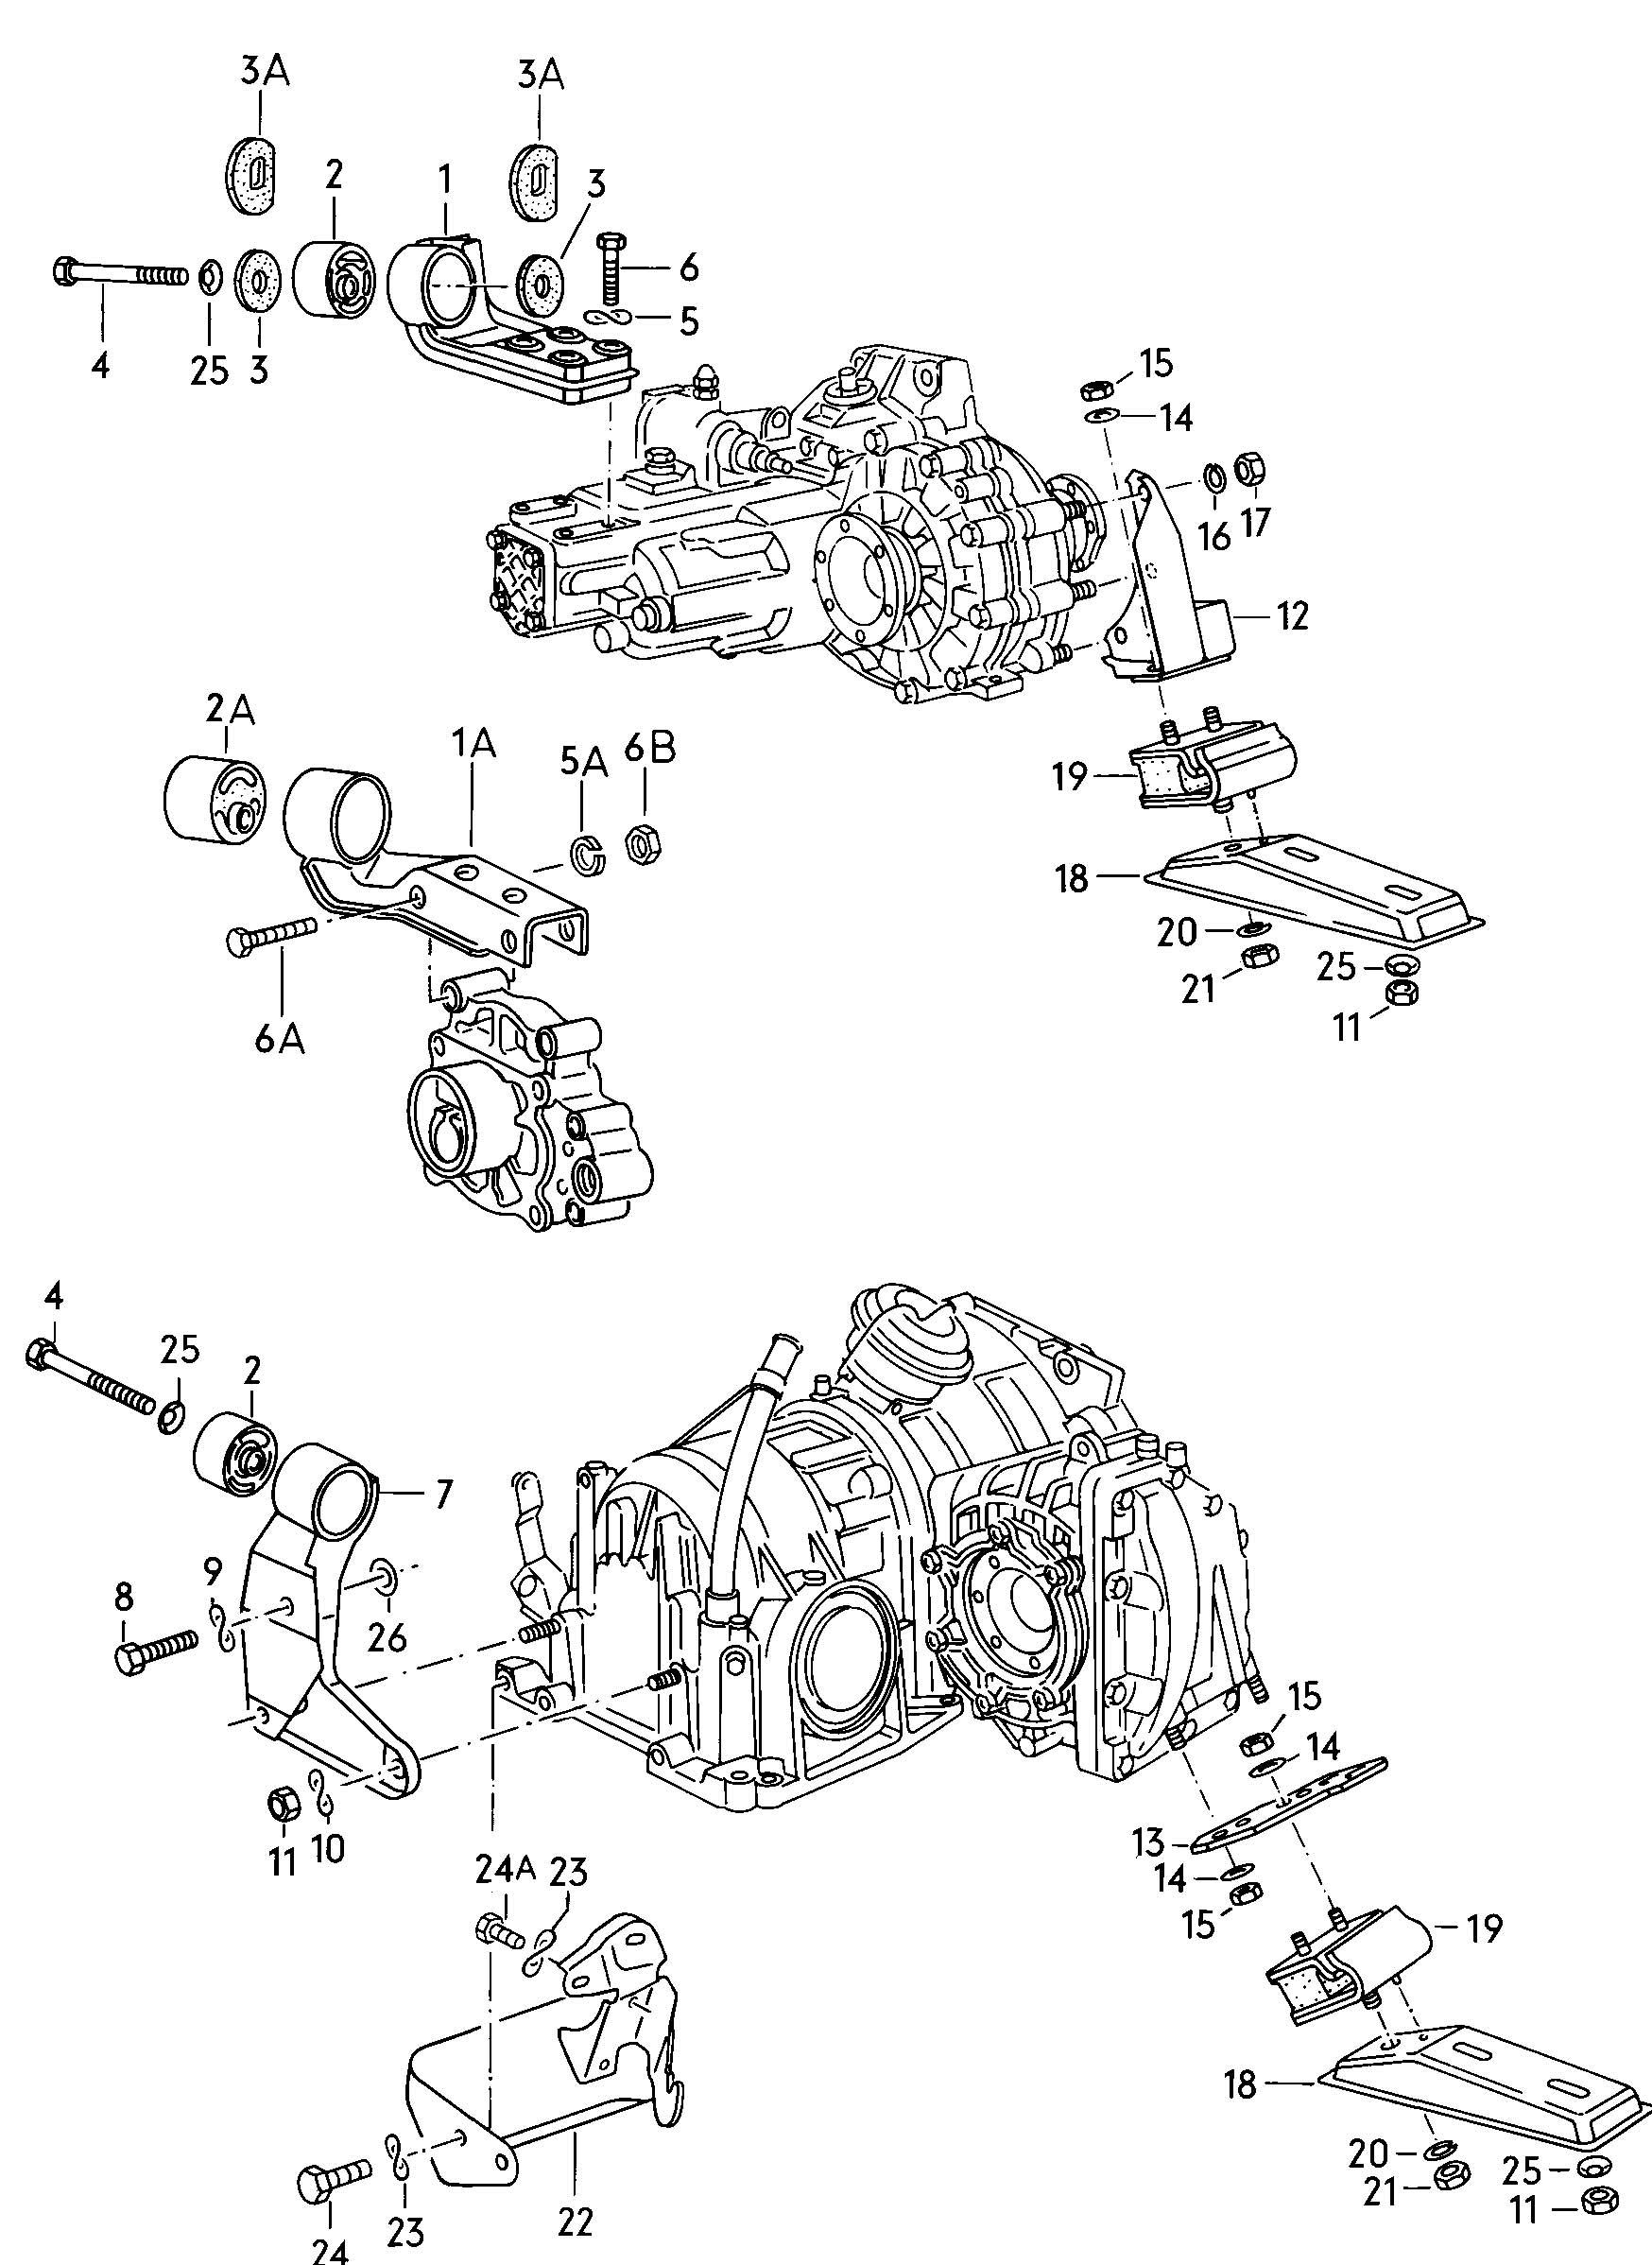 Volkswagen Rabbit Support for manual transmission